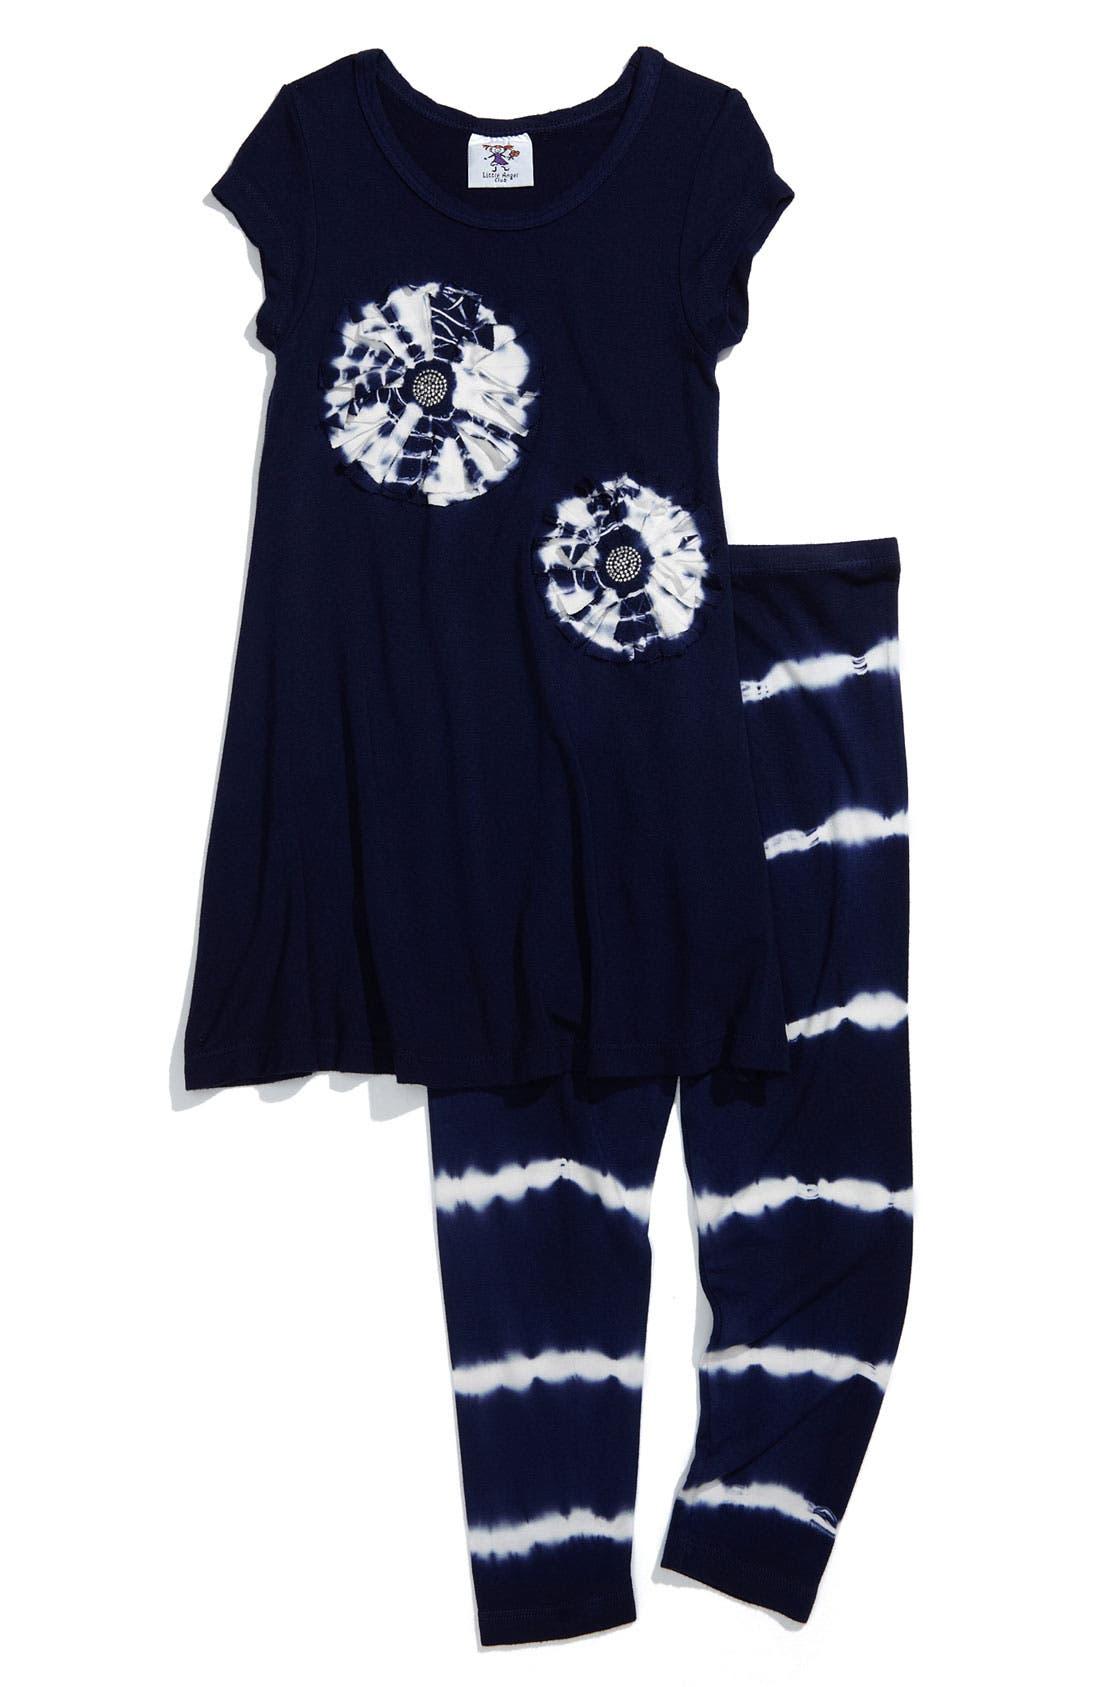 Alternate Image 1 Selected - Mignone 'Flyaway Flower' Tunic & Leggings Set (Toddler)